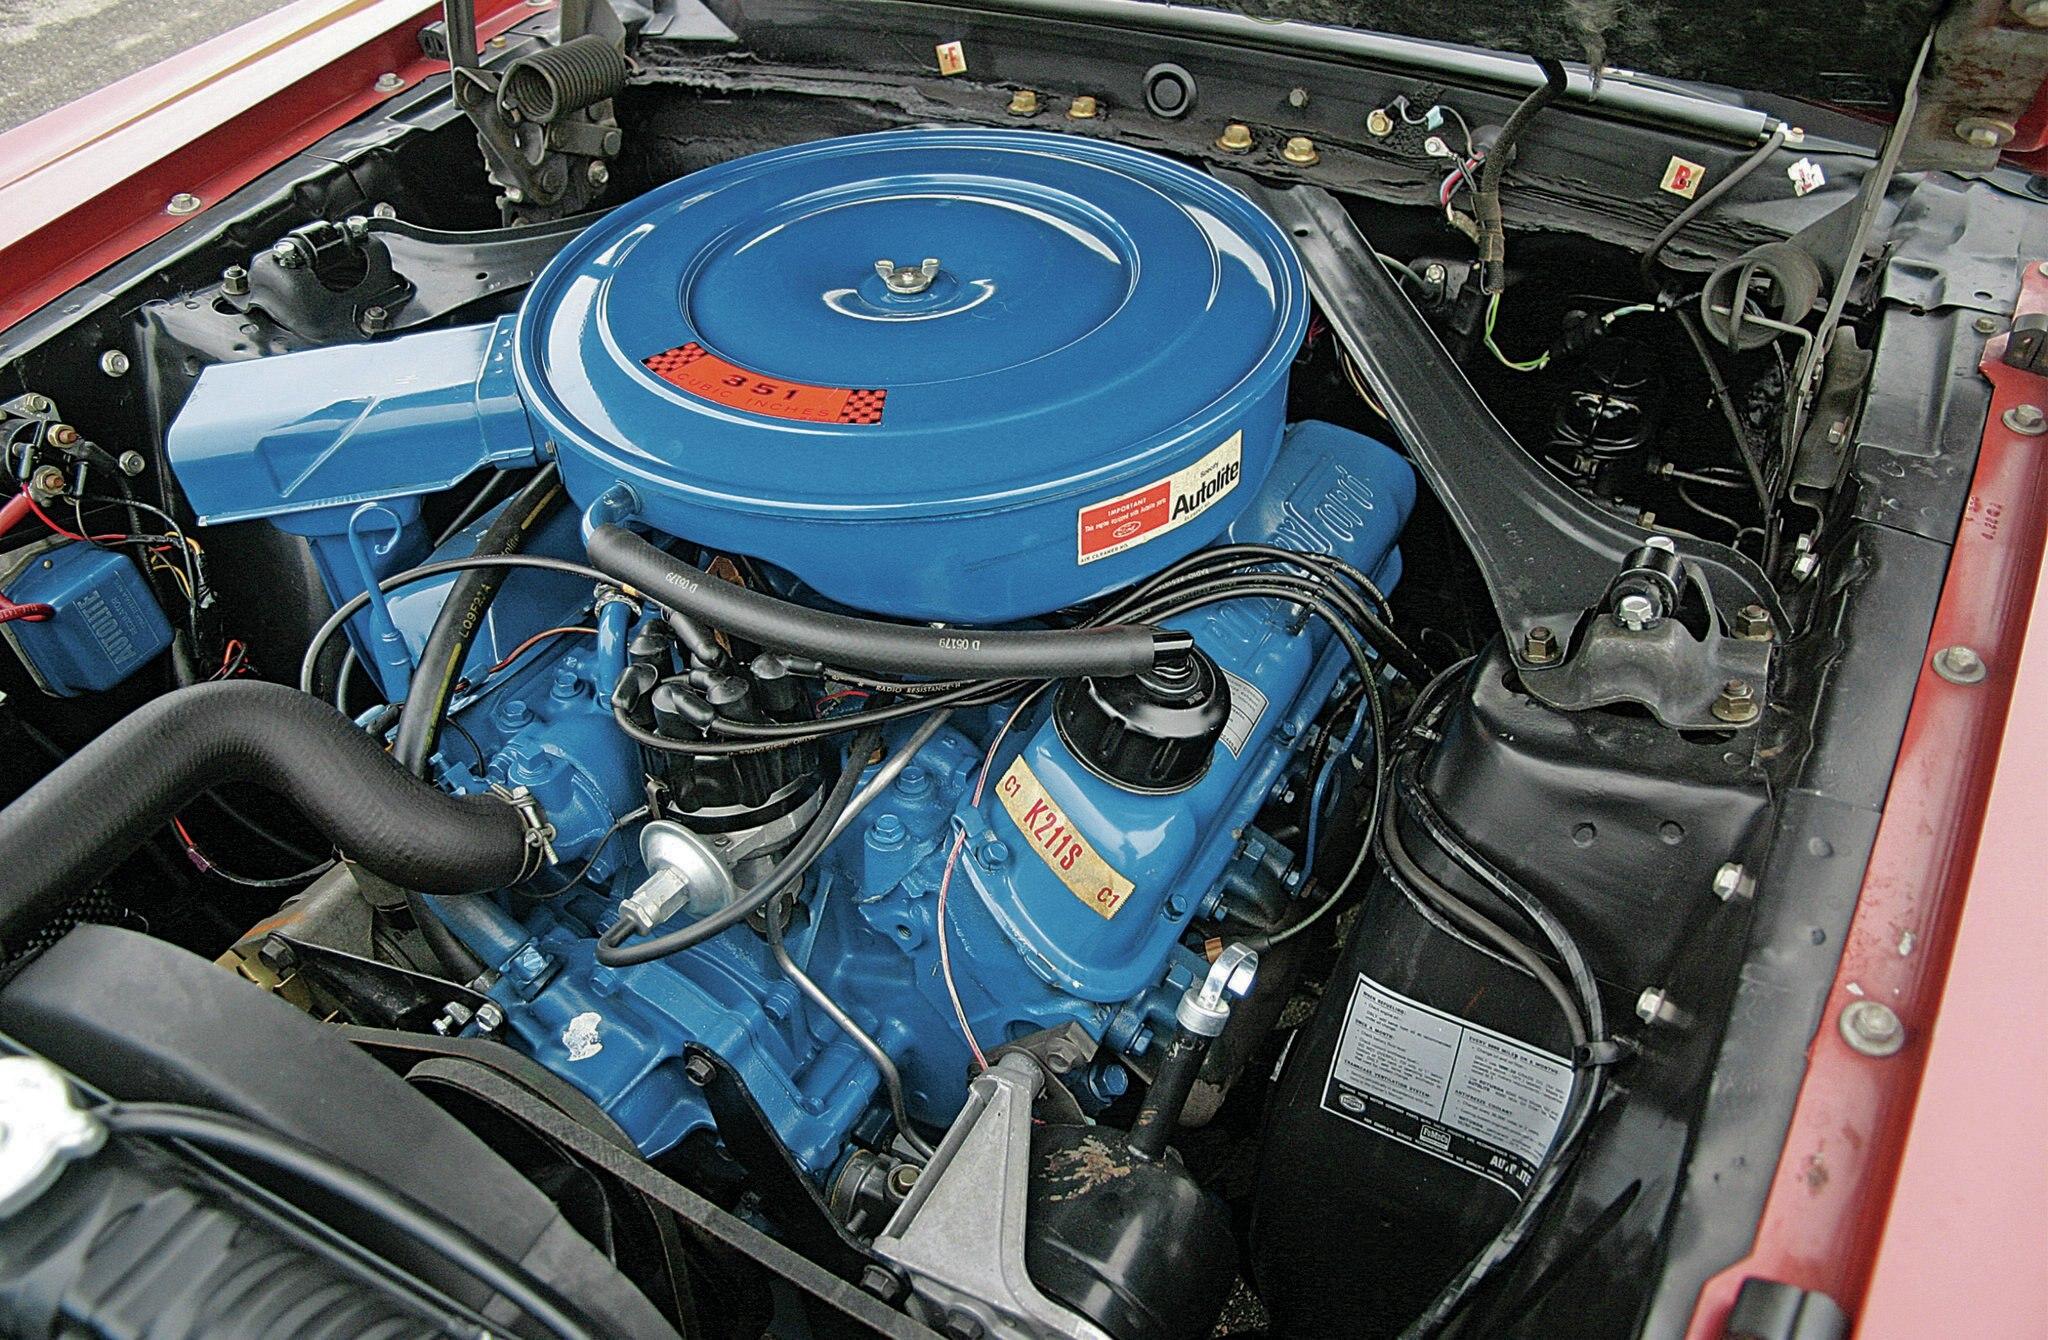 1967 chrysler 300 wiring diagram 1969 ford mustang mach 1 photo 93116363 matching the  1969 ford mustang mach 1 photo 93116363 matching the